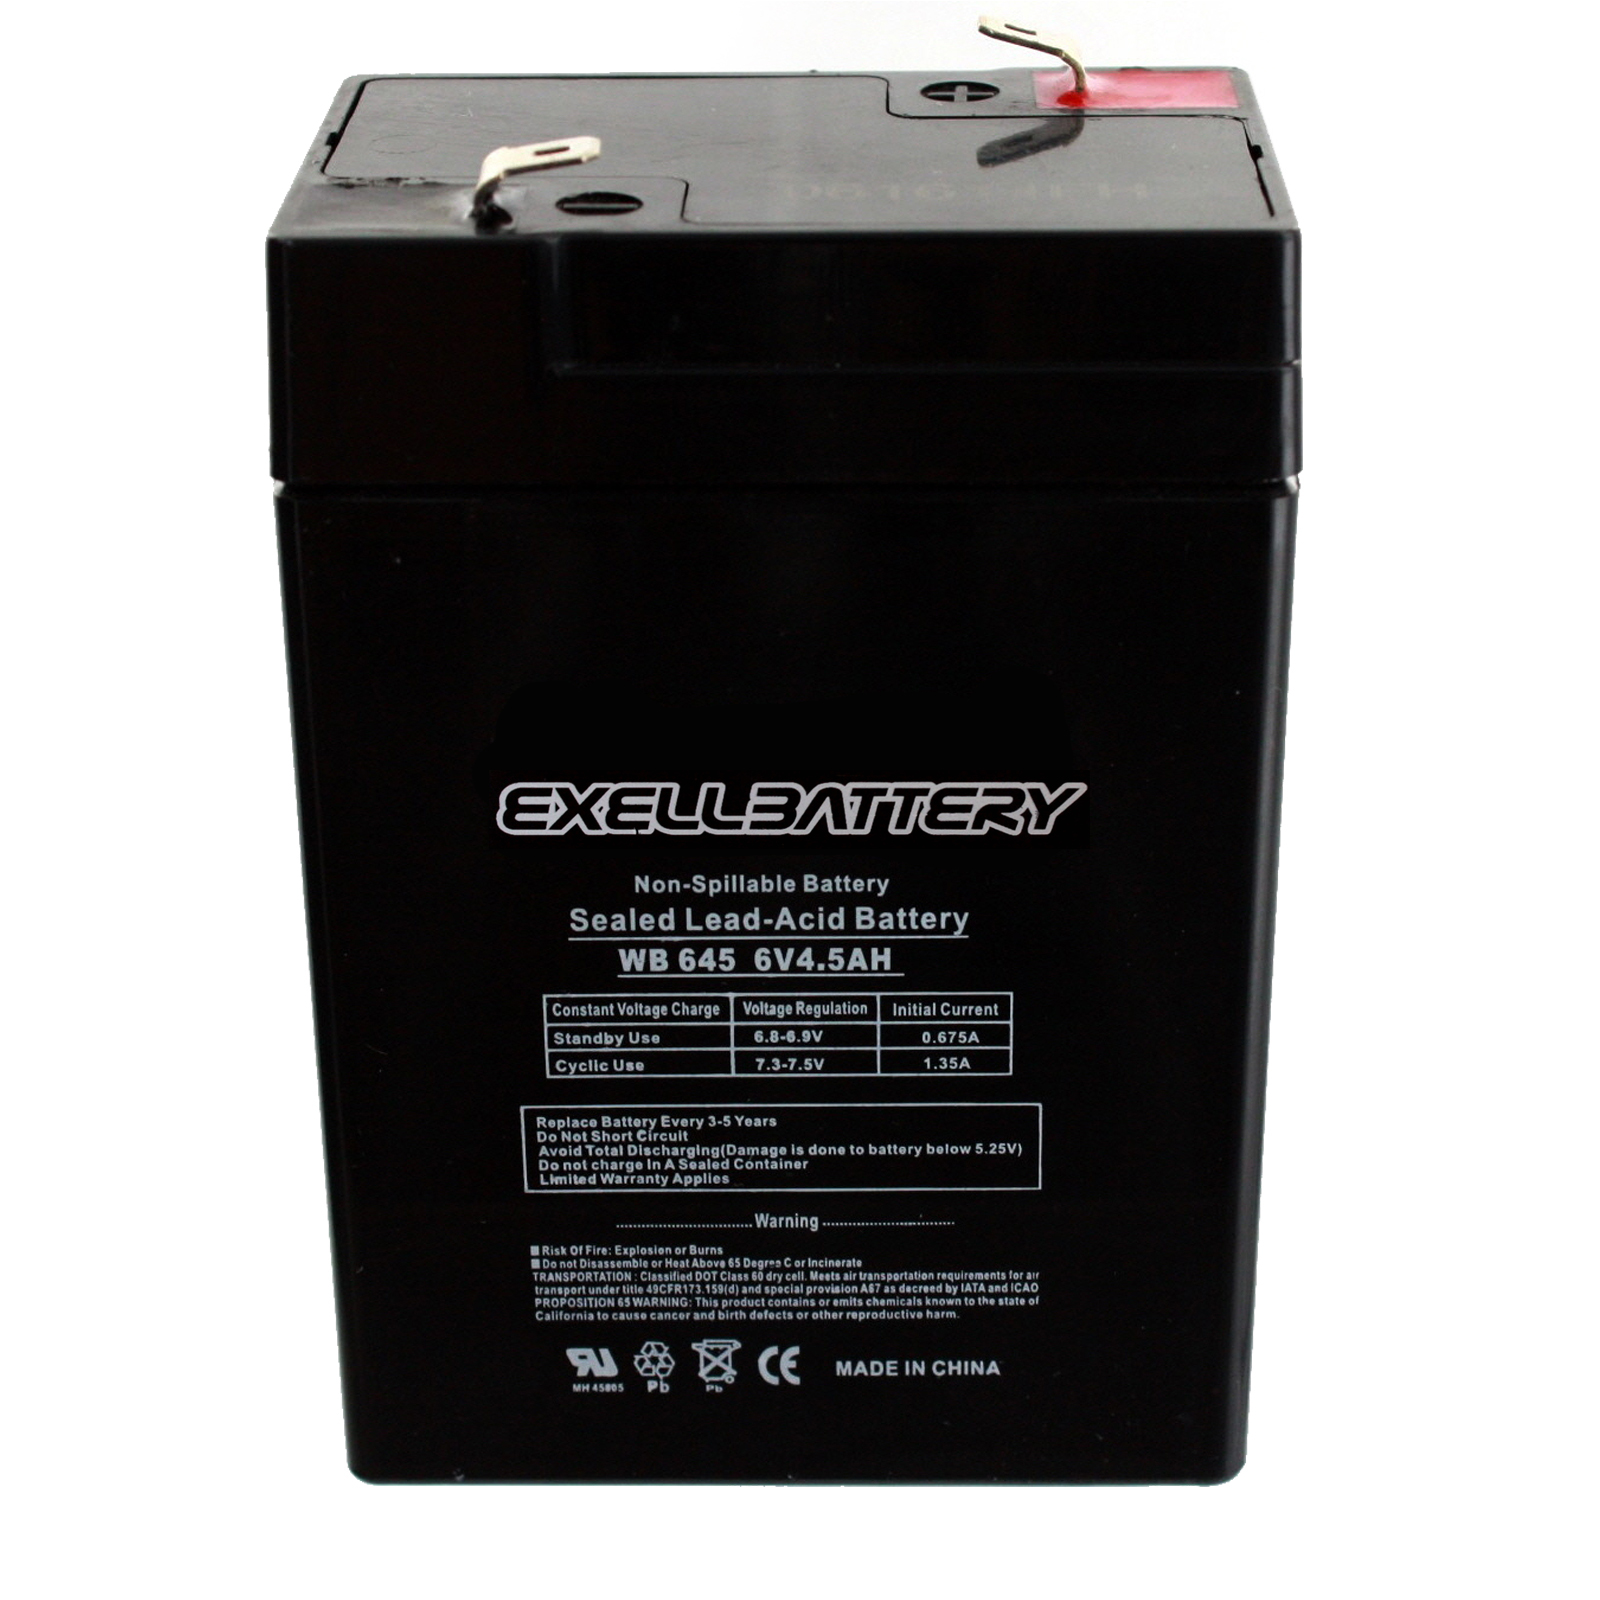 SLA Set of 4 by UPS Battery Center 6V 4.5AH Rechargeable Sealed Lead Acid Battery for Exit Lights